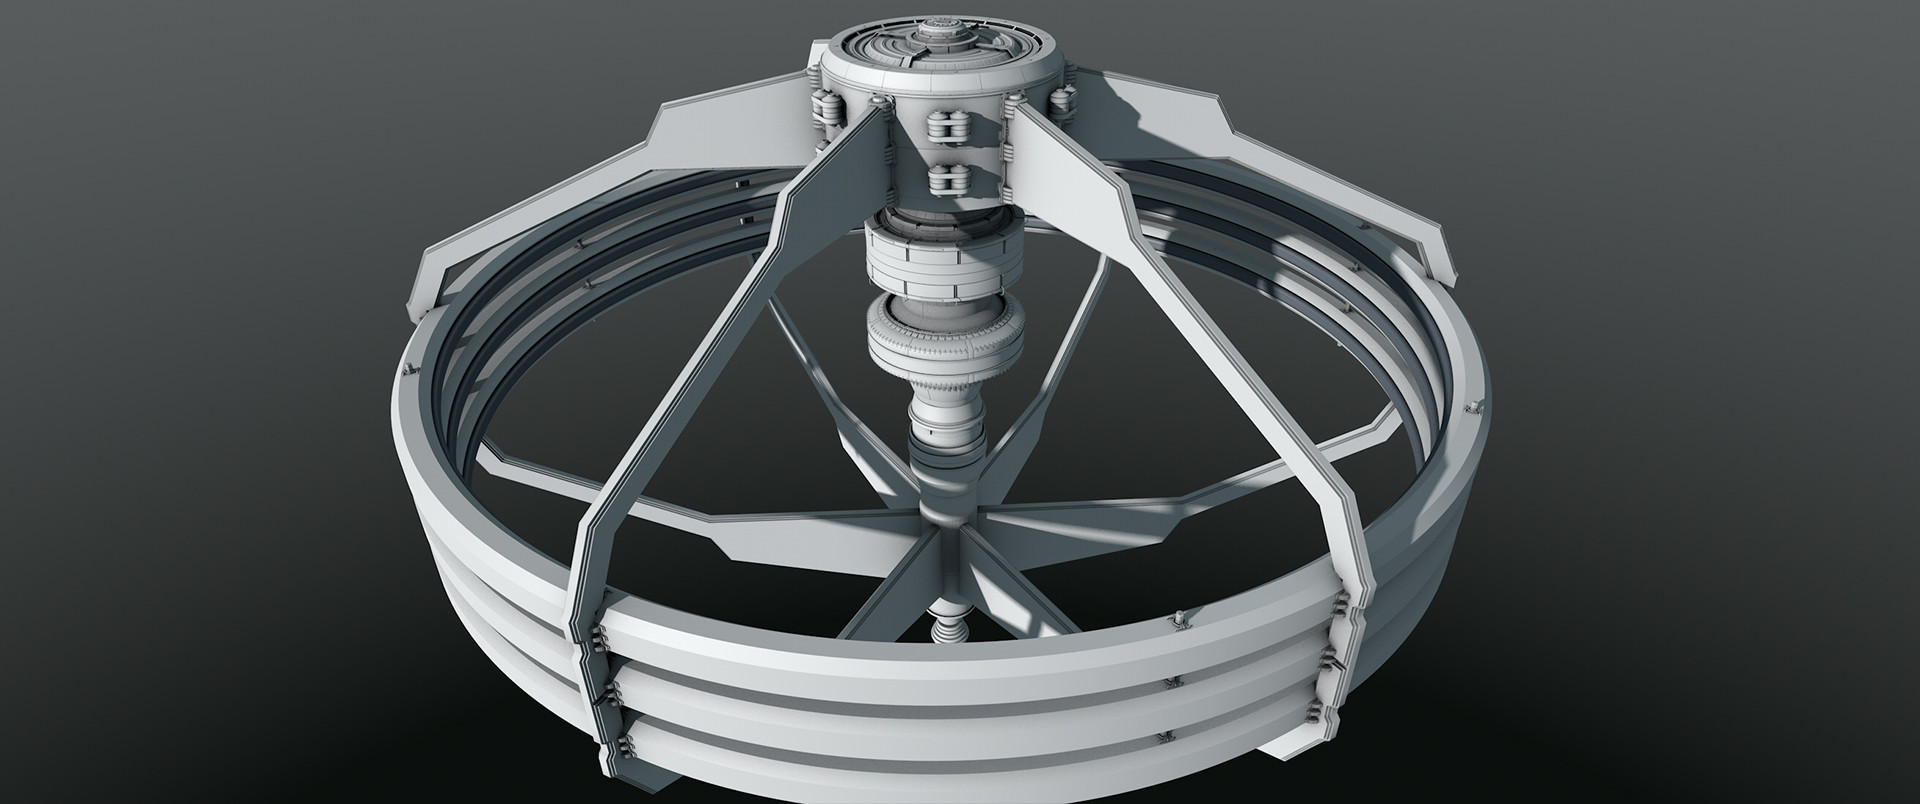 Glenn clovis spacestation concept 9 002